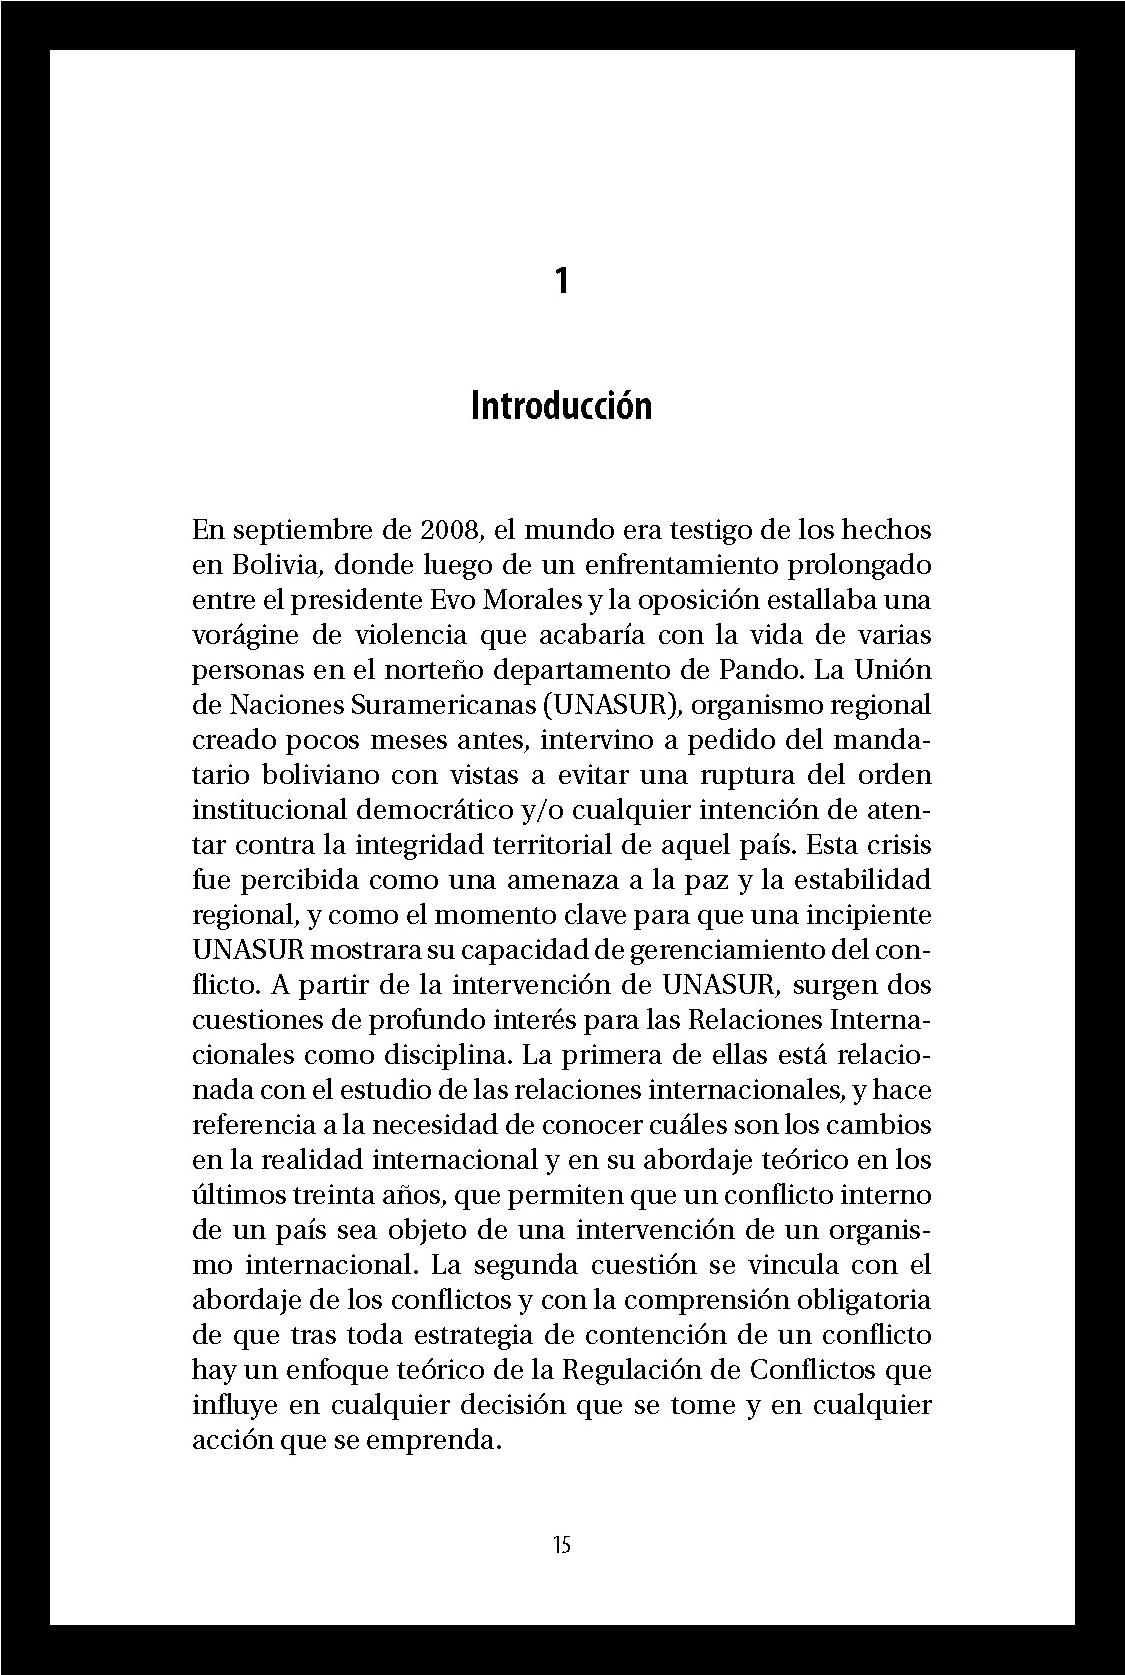 libro-intro.png